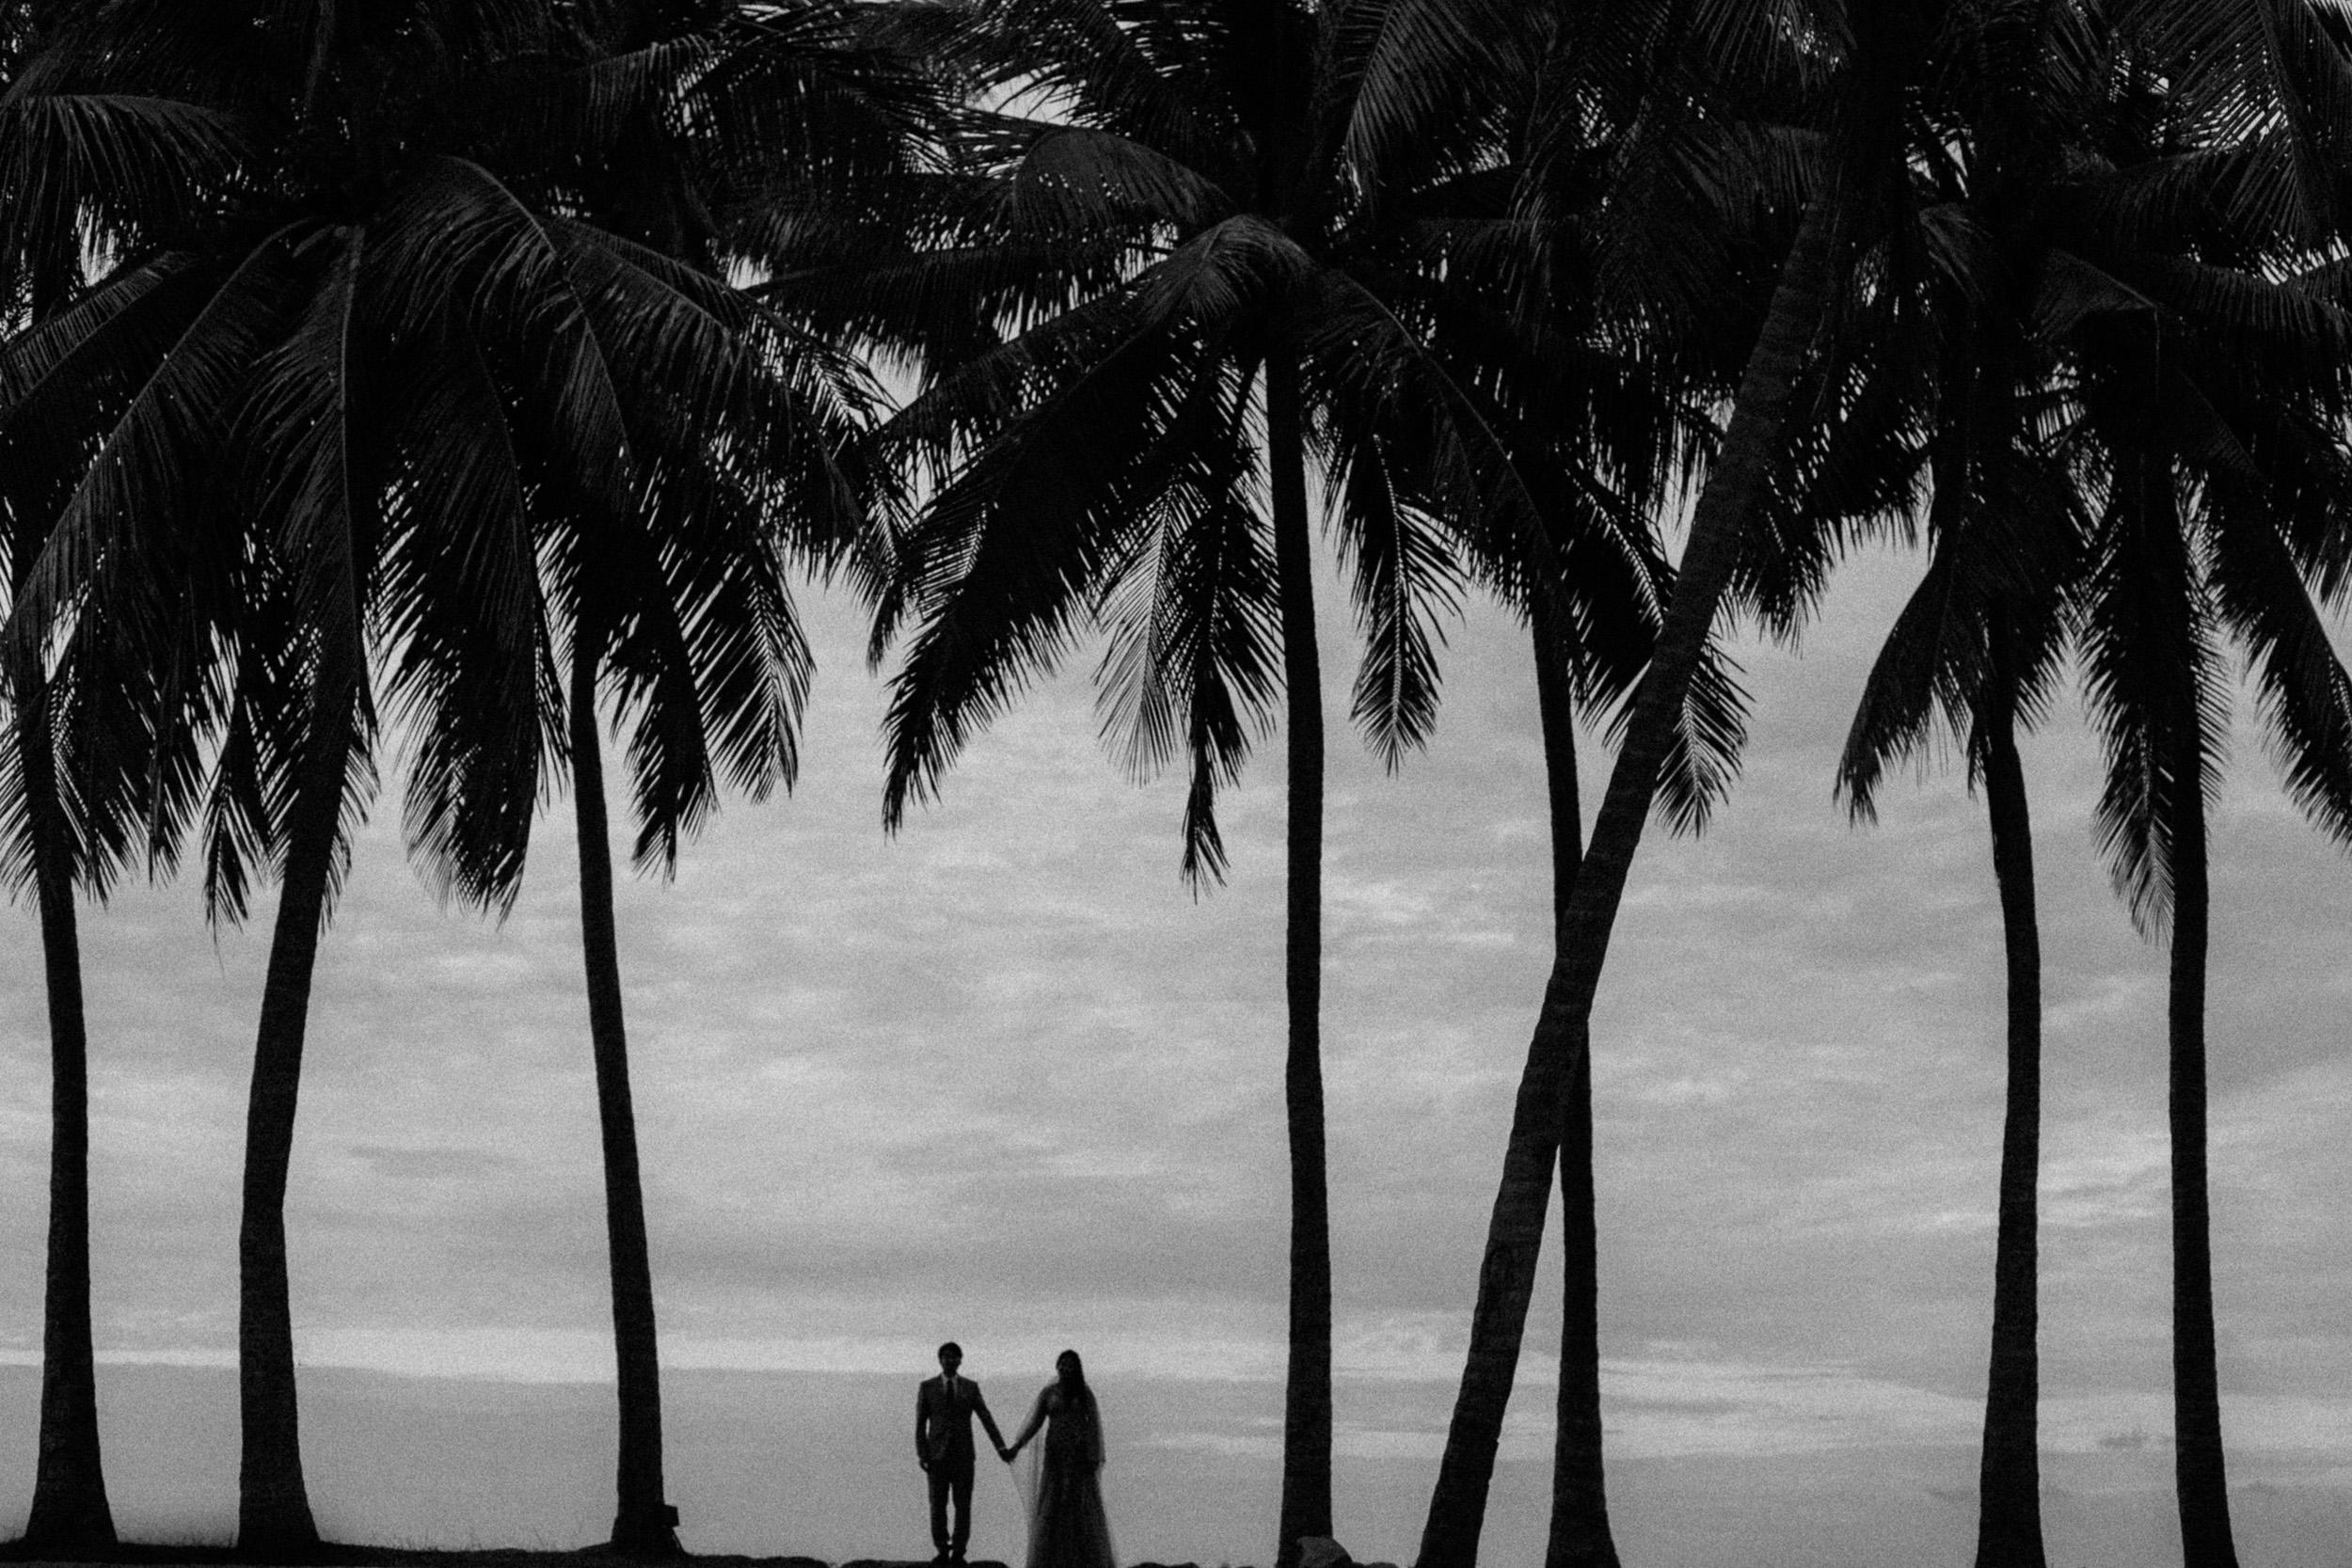 singapore-wedding-photographer-photography-wmt2017-023.jpg